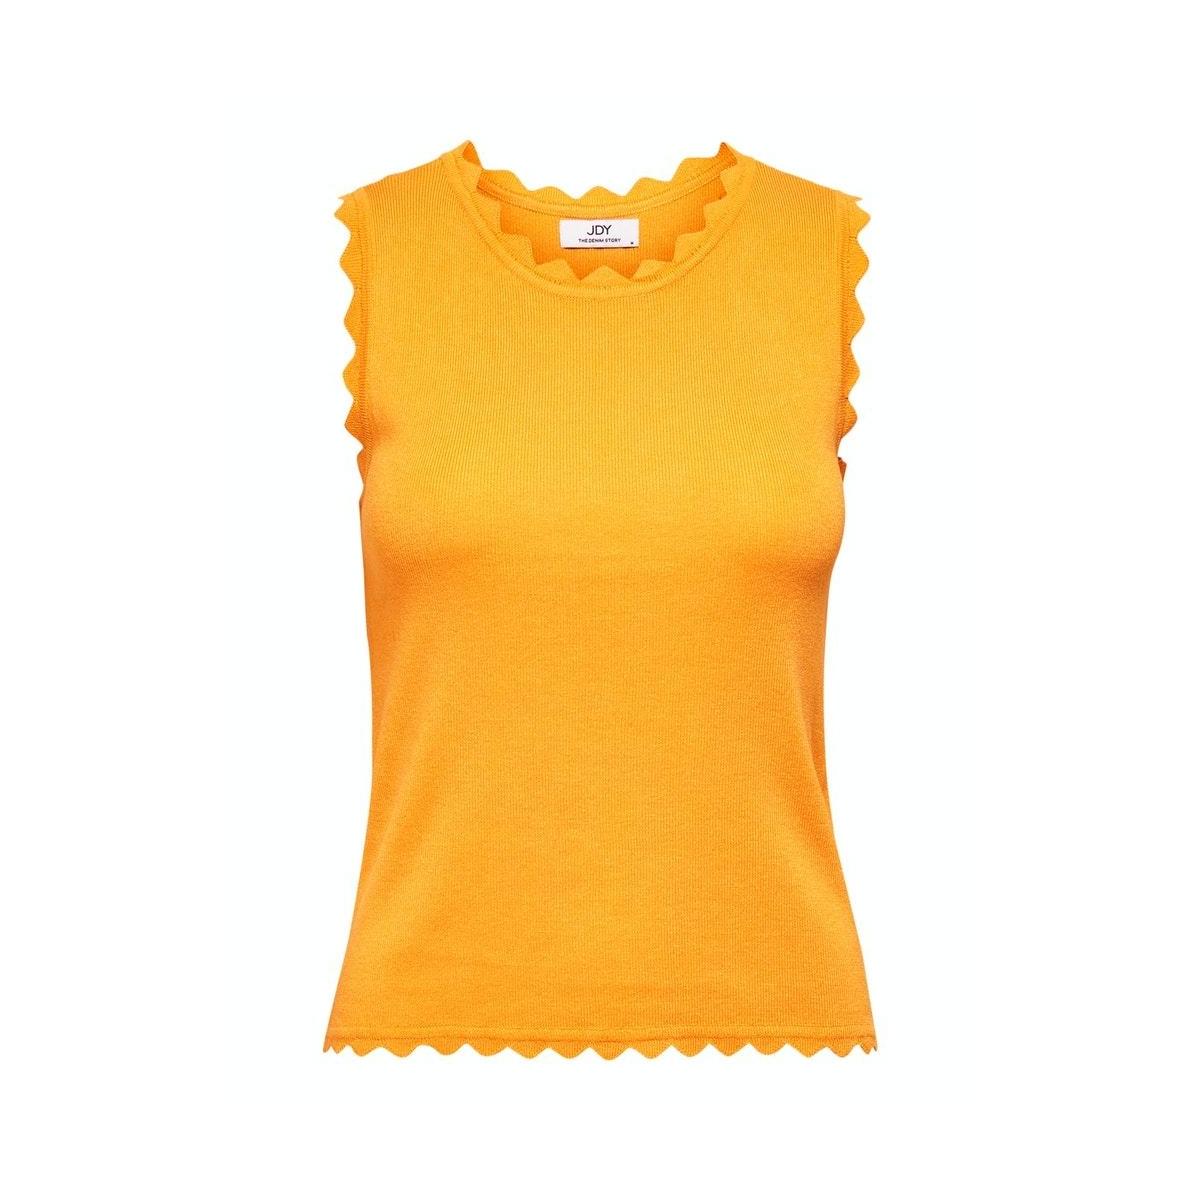 jdydelilah s/l top knt denim 15200523 jacqueline de yong top kumquat